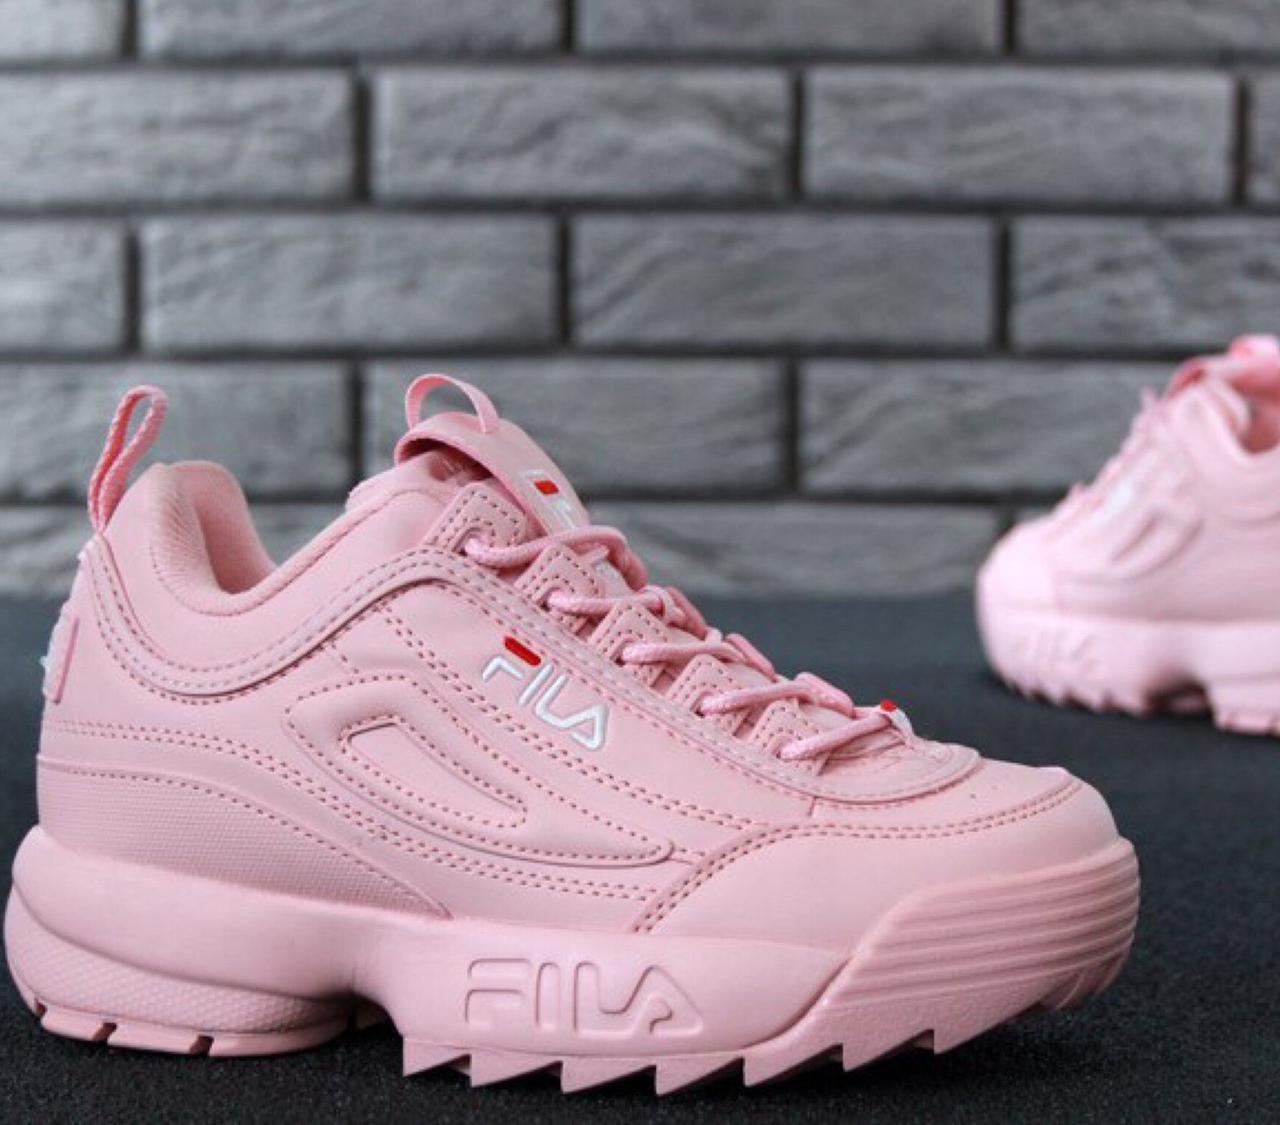 Женские кроссовки в стиле Fila Disruptor 2(II) Pink 39 - Интернет-магазин f34a5af10f0c0